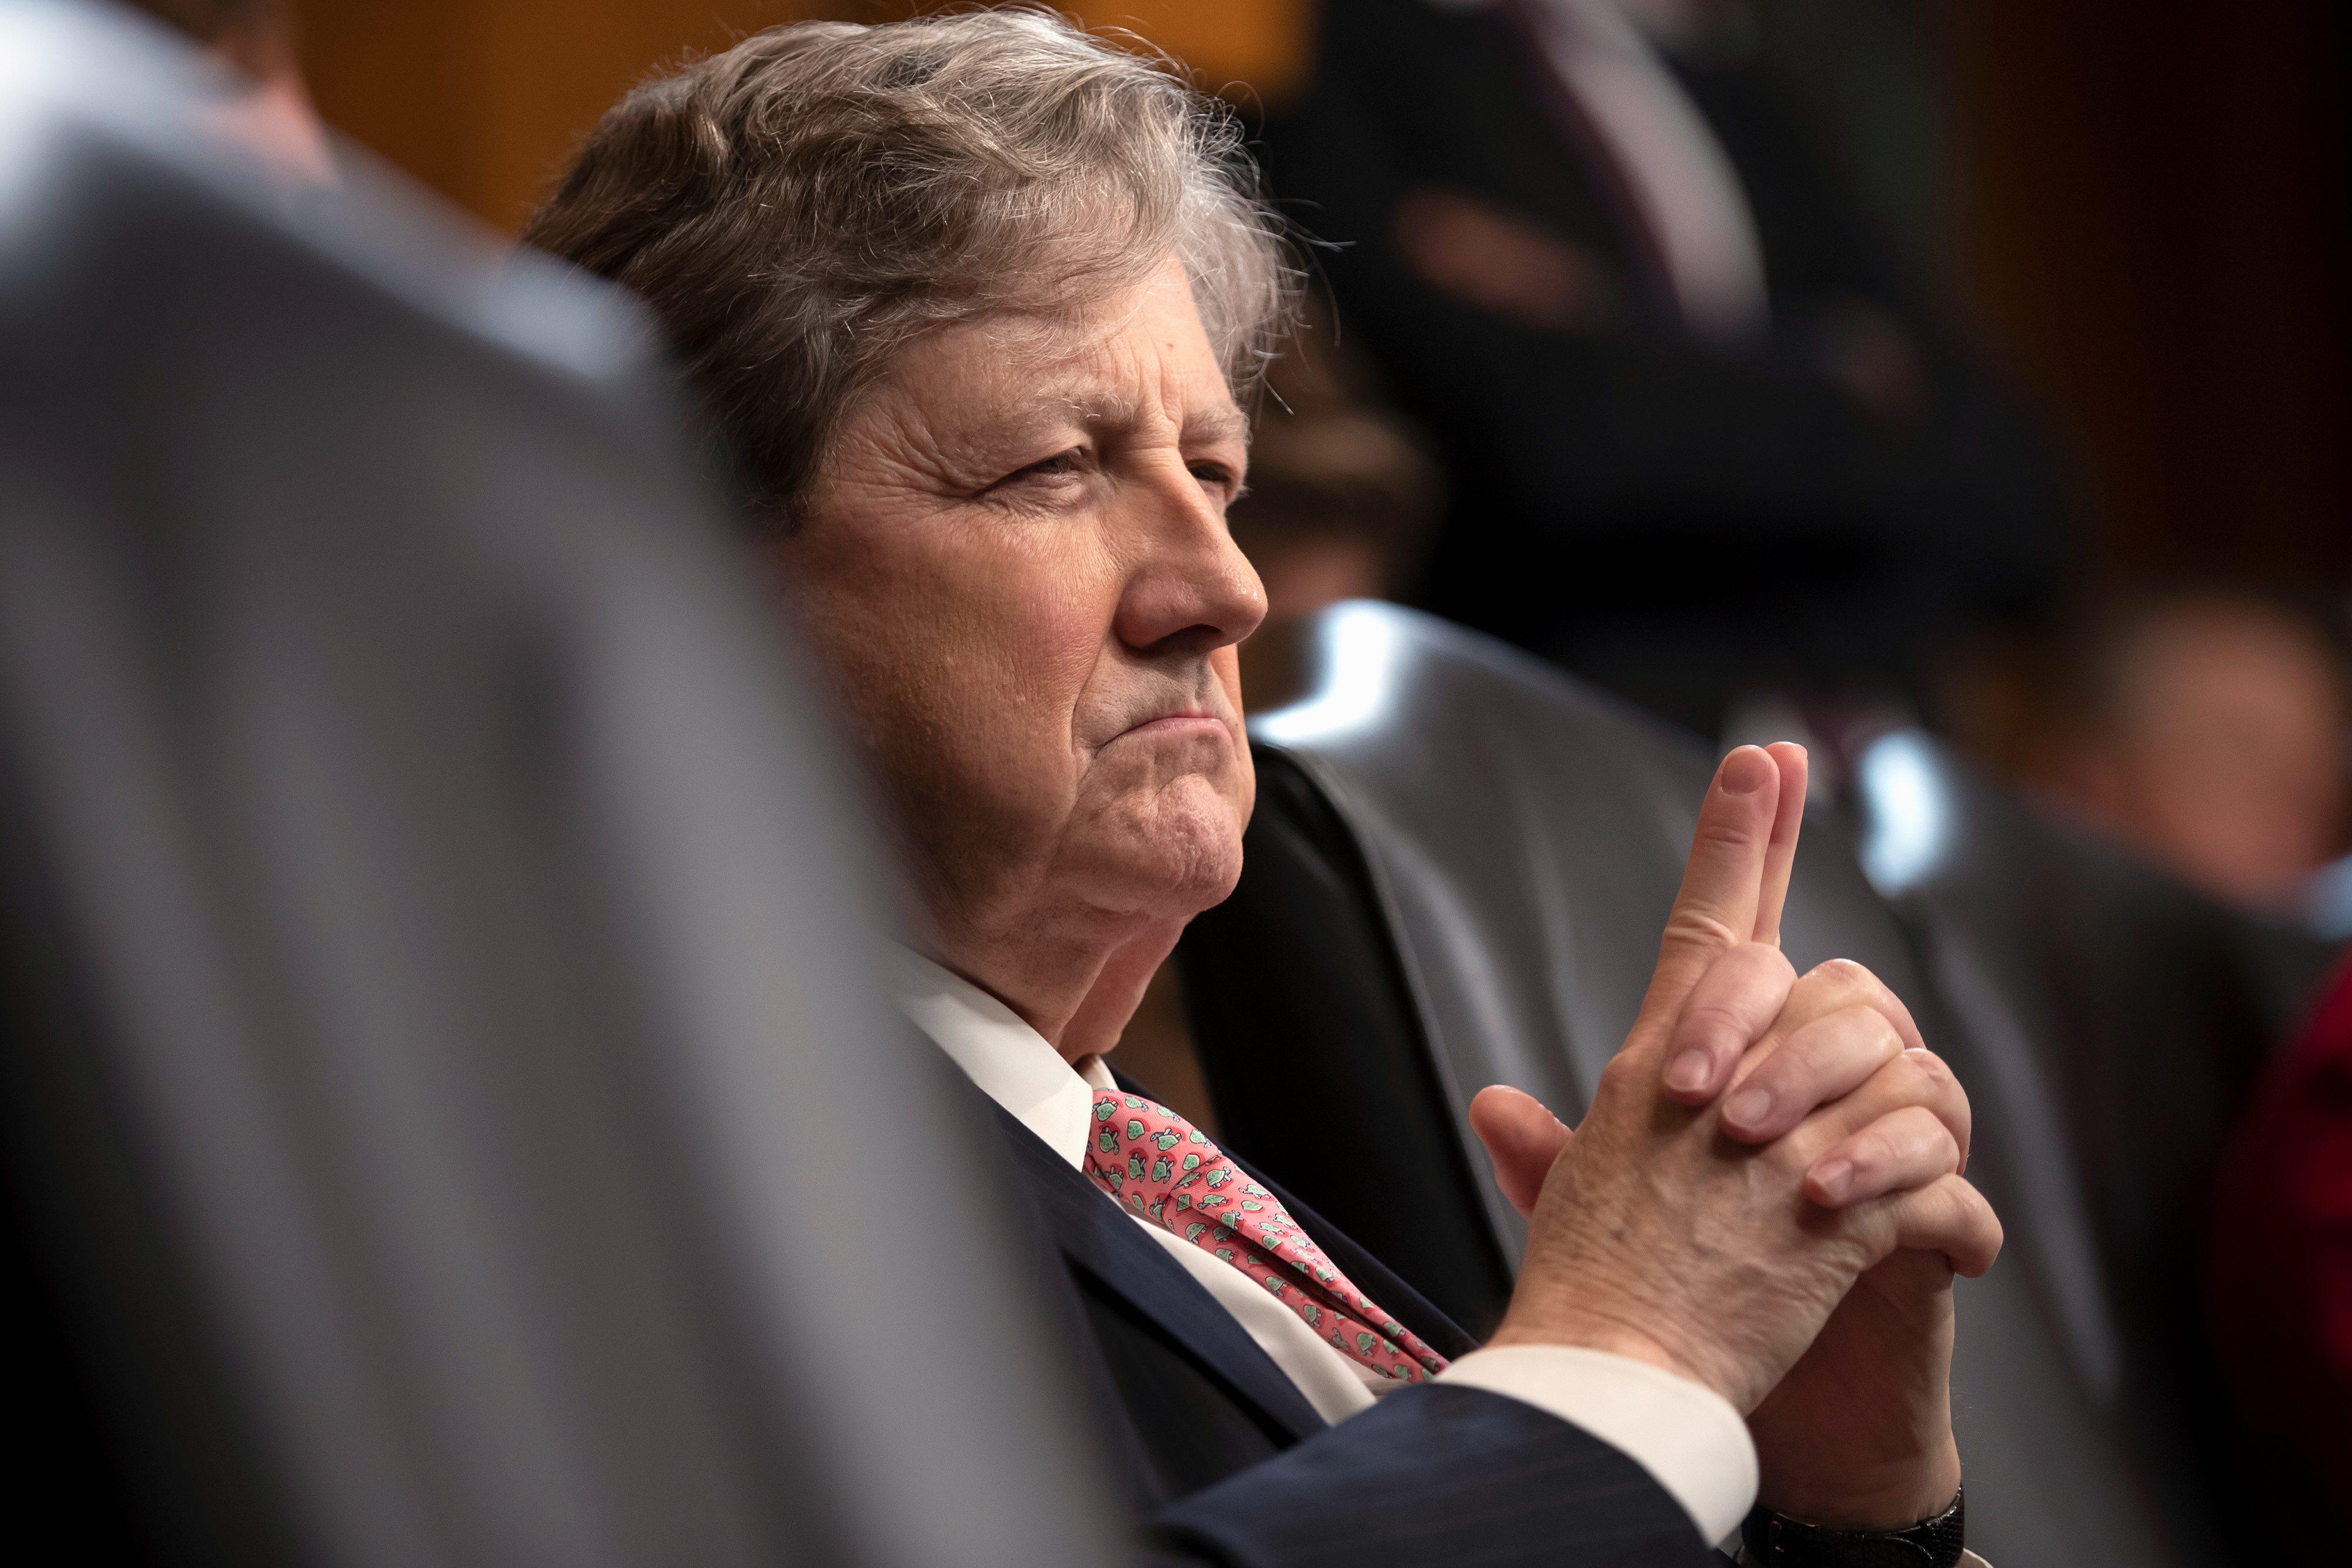 John Kennedy bill to get savings bond money to owners